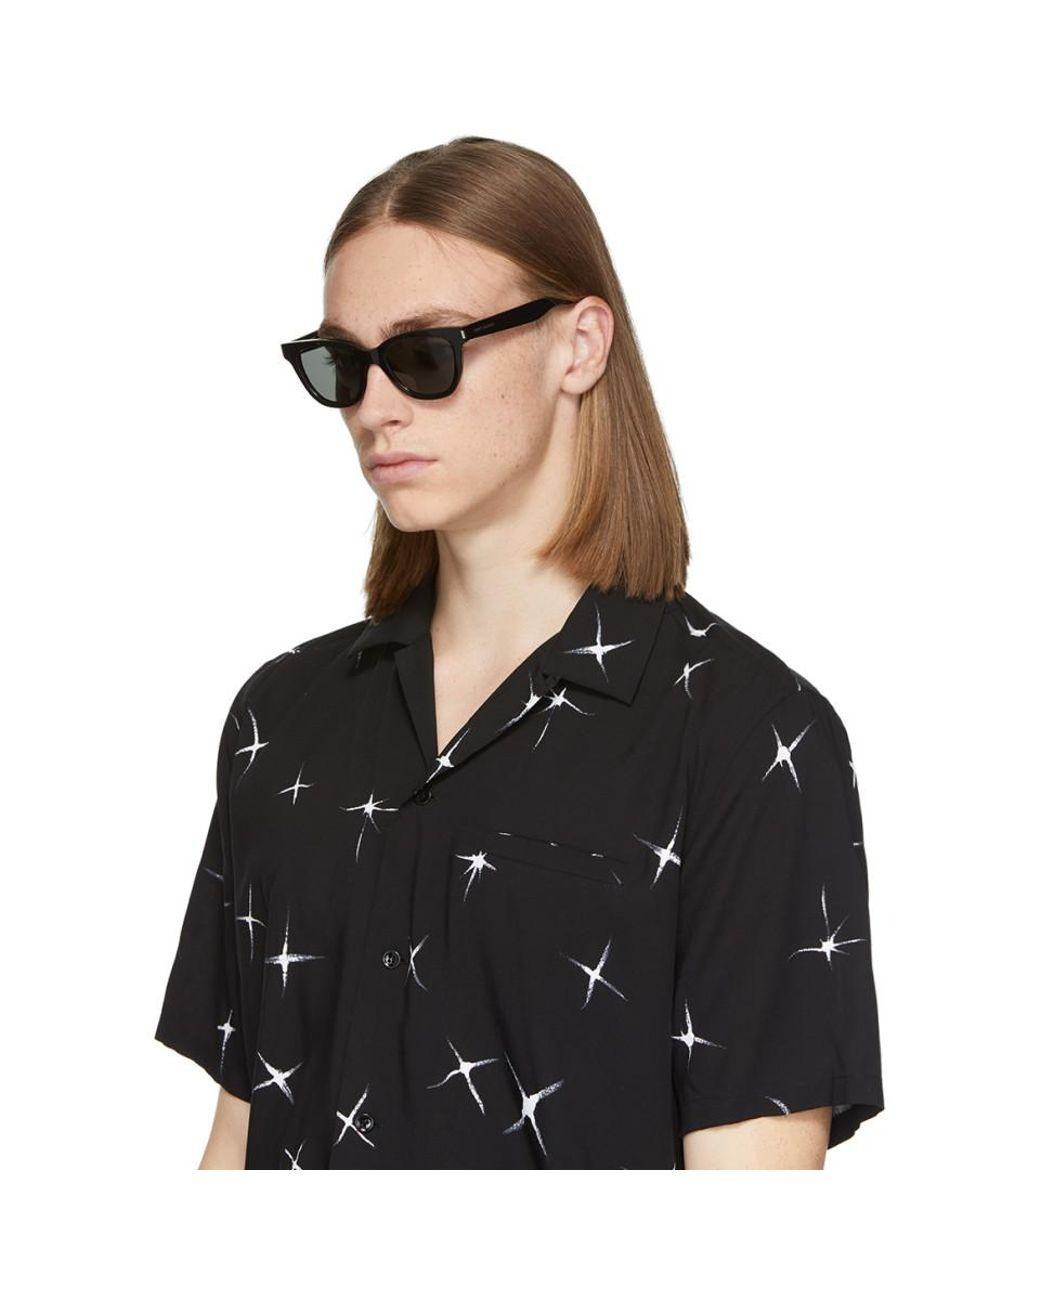 474b32d5 Men's Black Small Sl 51 Sunglasses